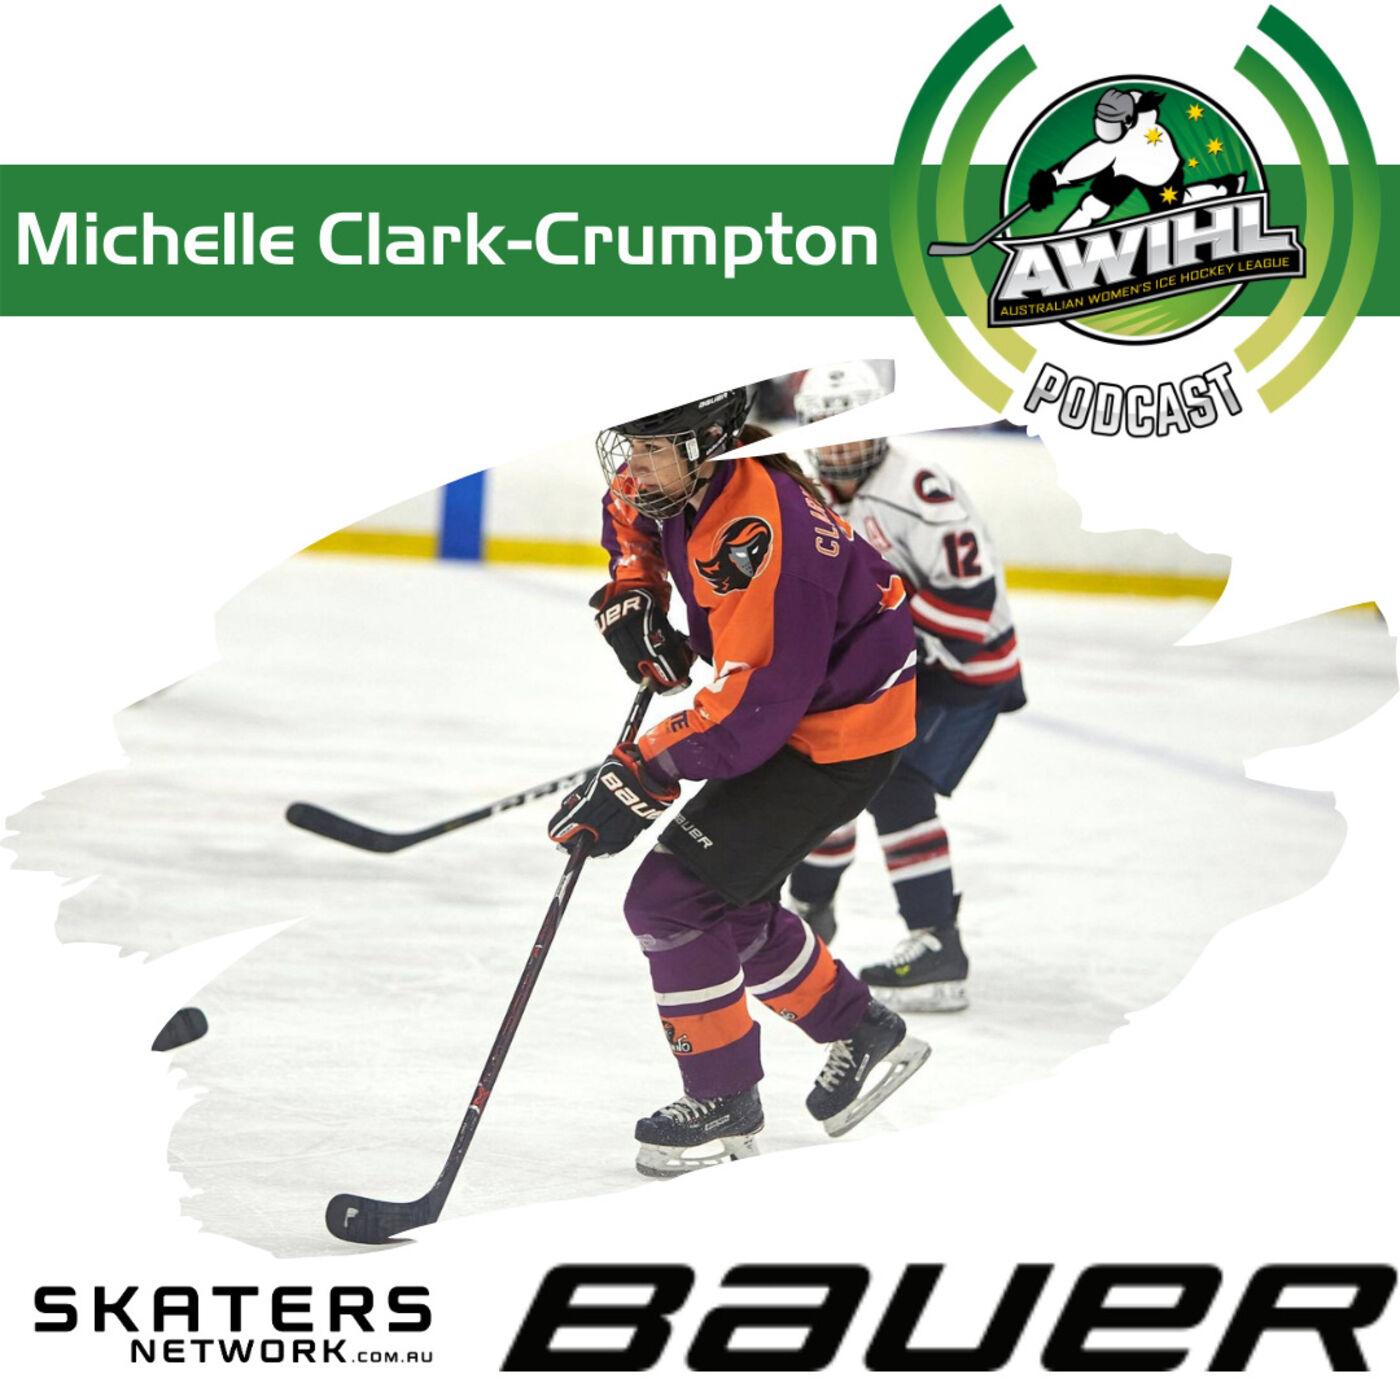 Episode Four - Michelle Clark-Crumpton